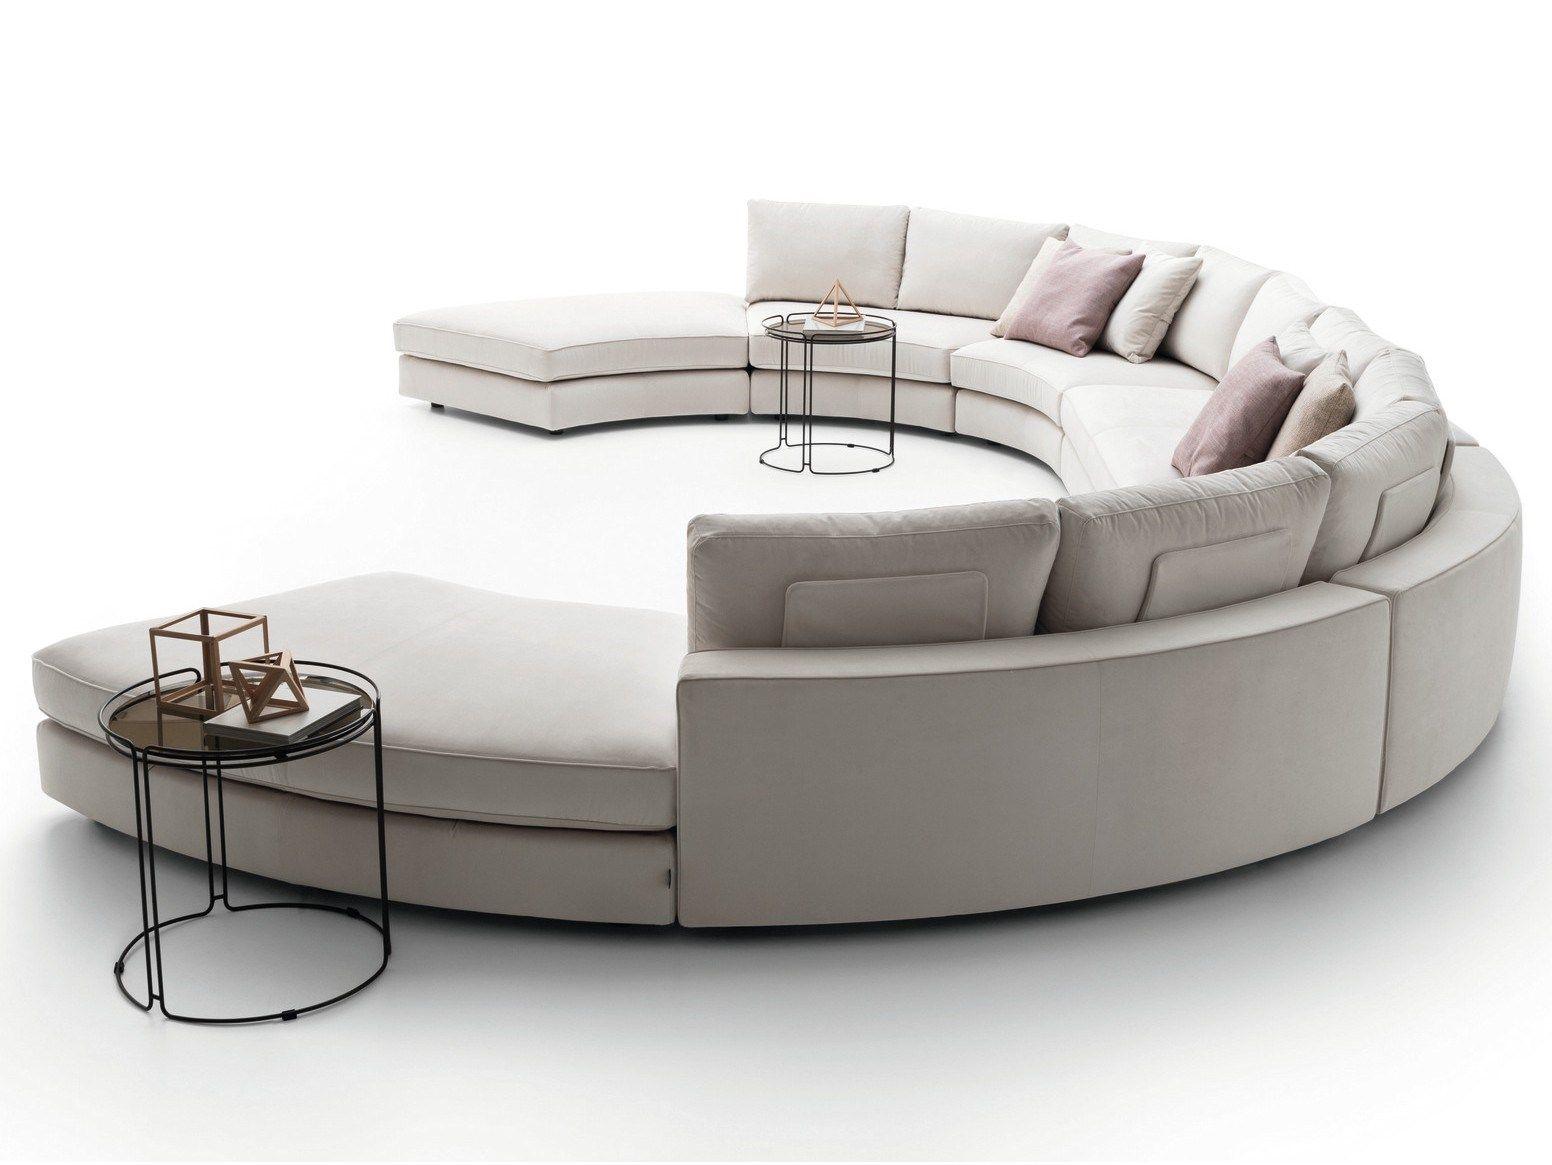 Loman Curved Sofa By Ditre Italia Design Stefano Spessotto